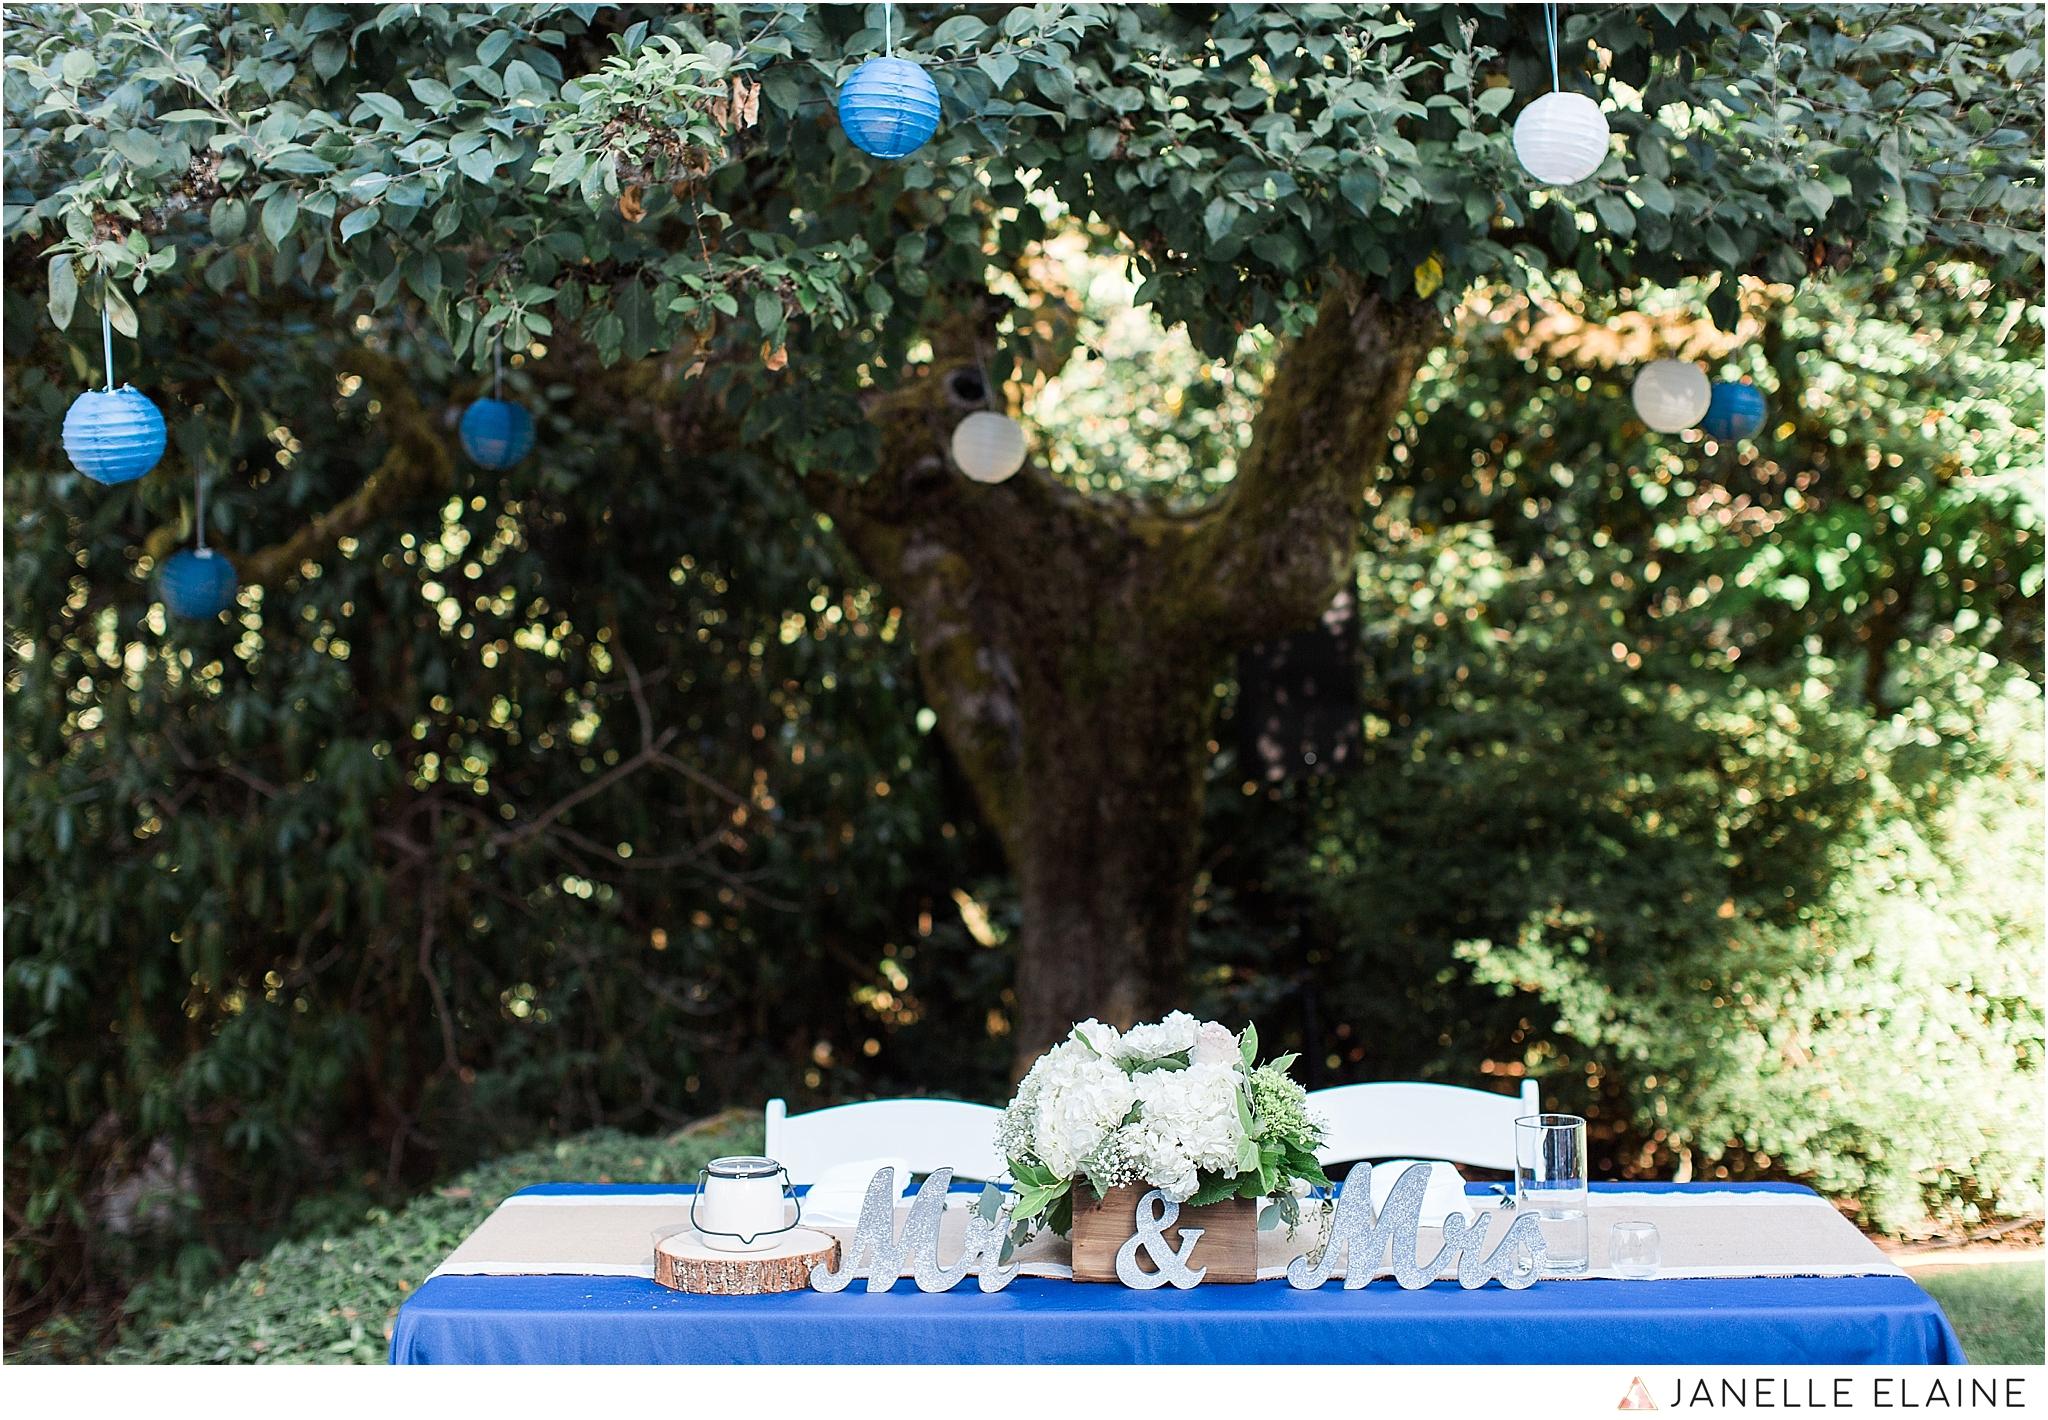 janelle elaine photography-professional wedding photographer-seattle-bellevue-robinswood house-108.jpg